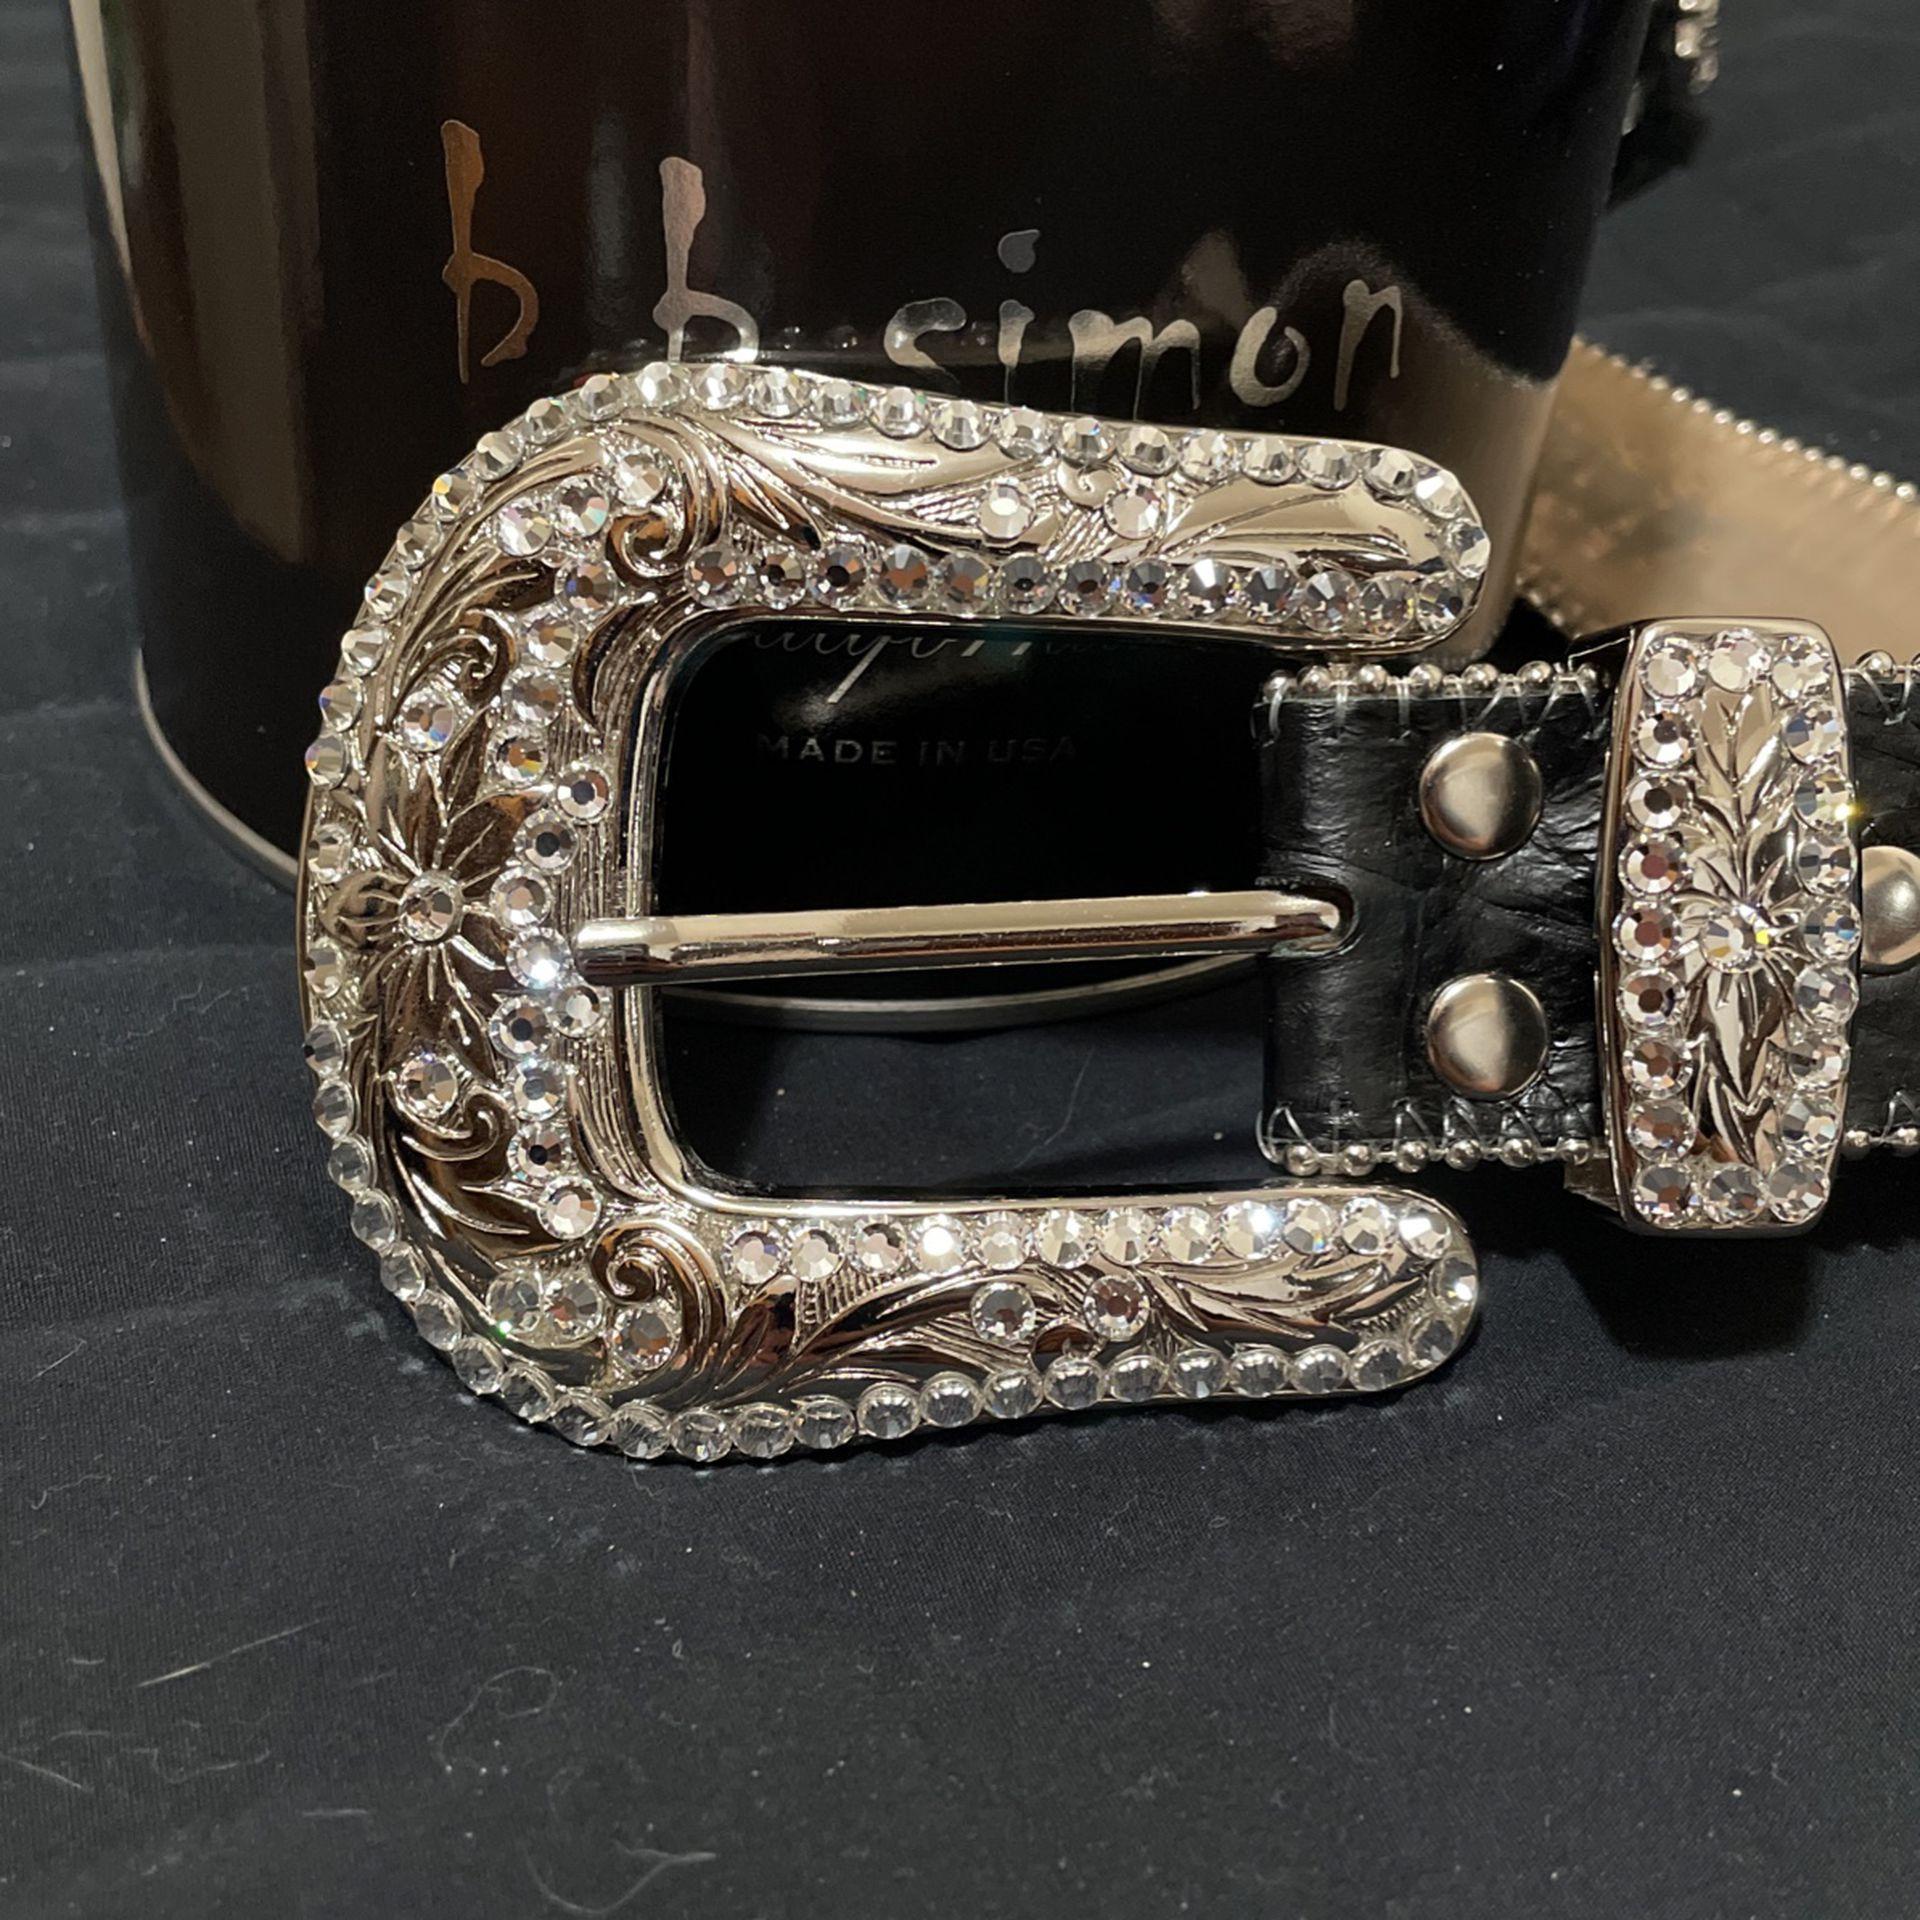 bb simon belt